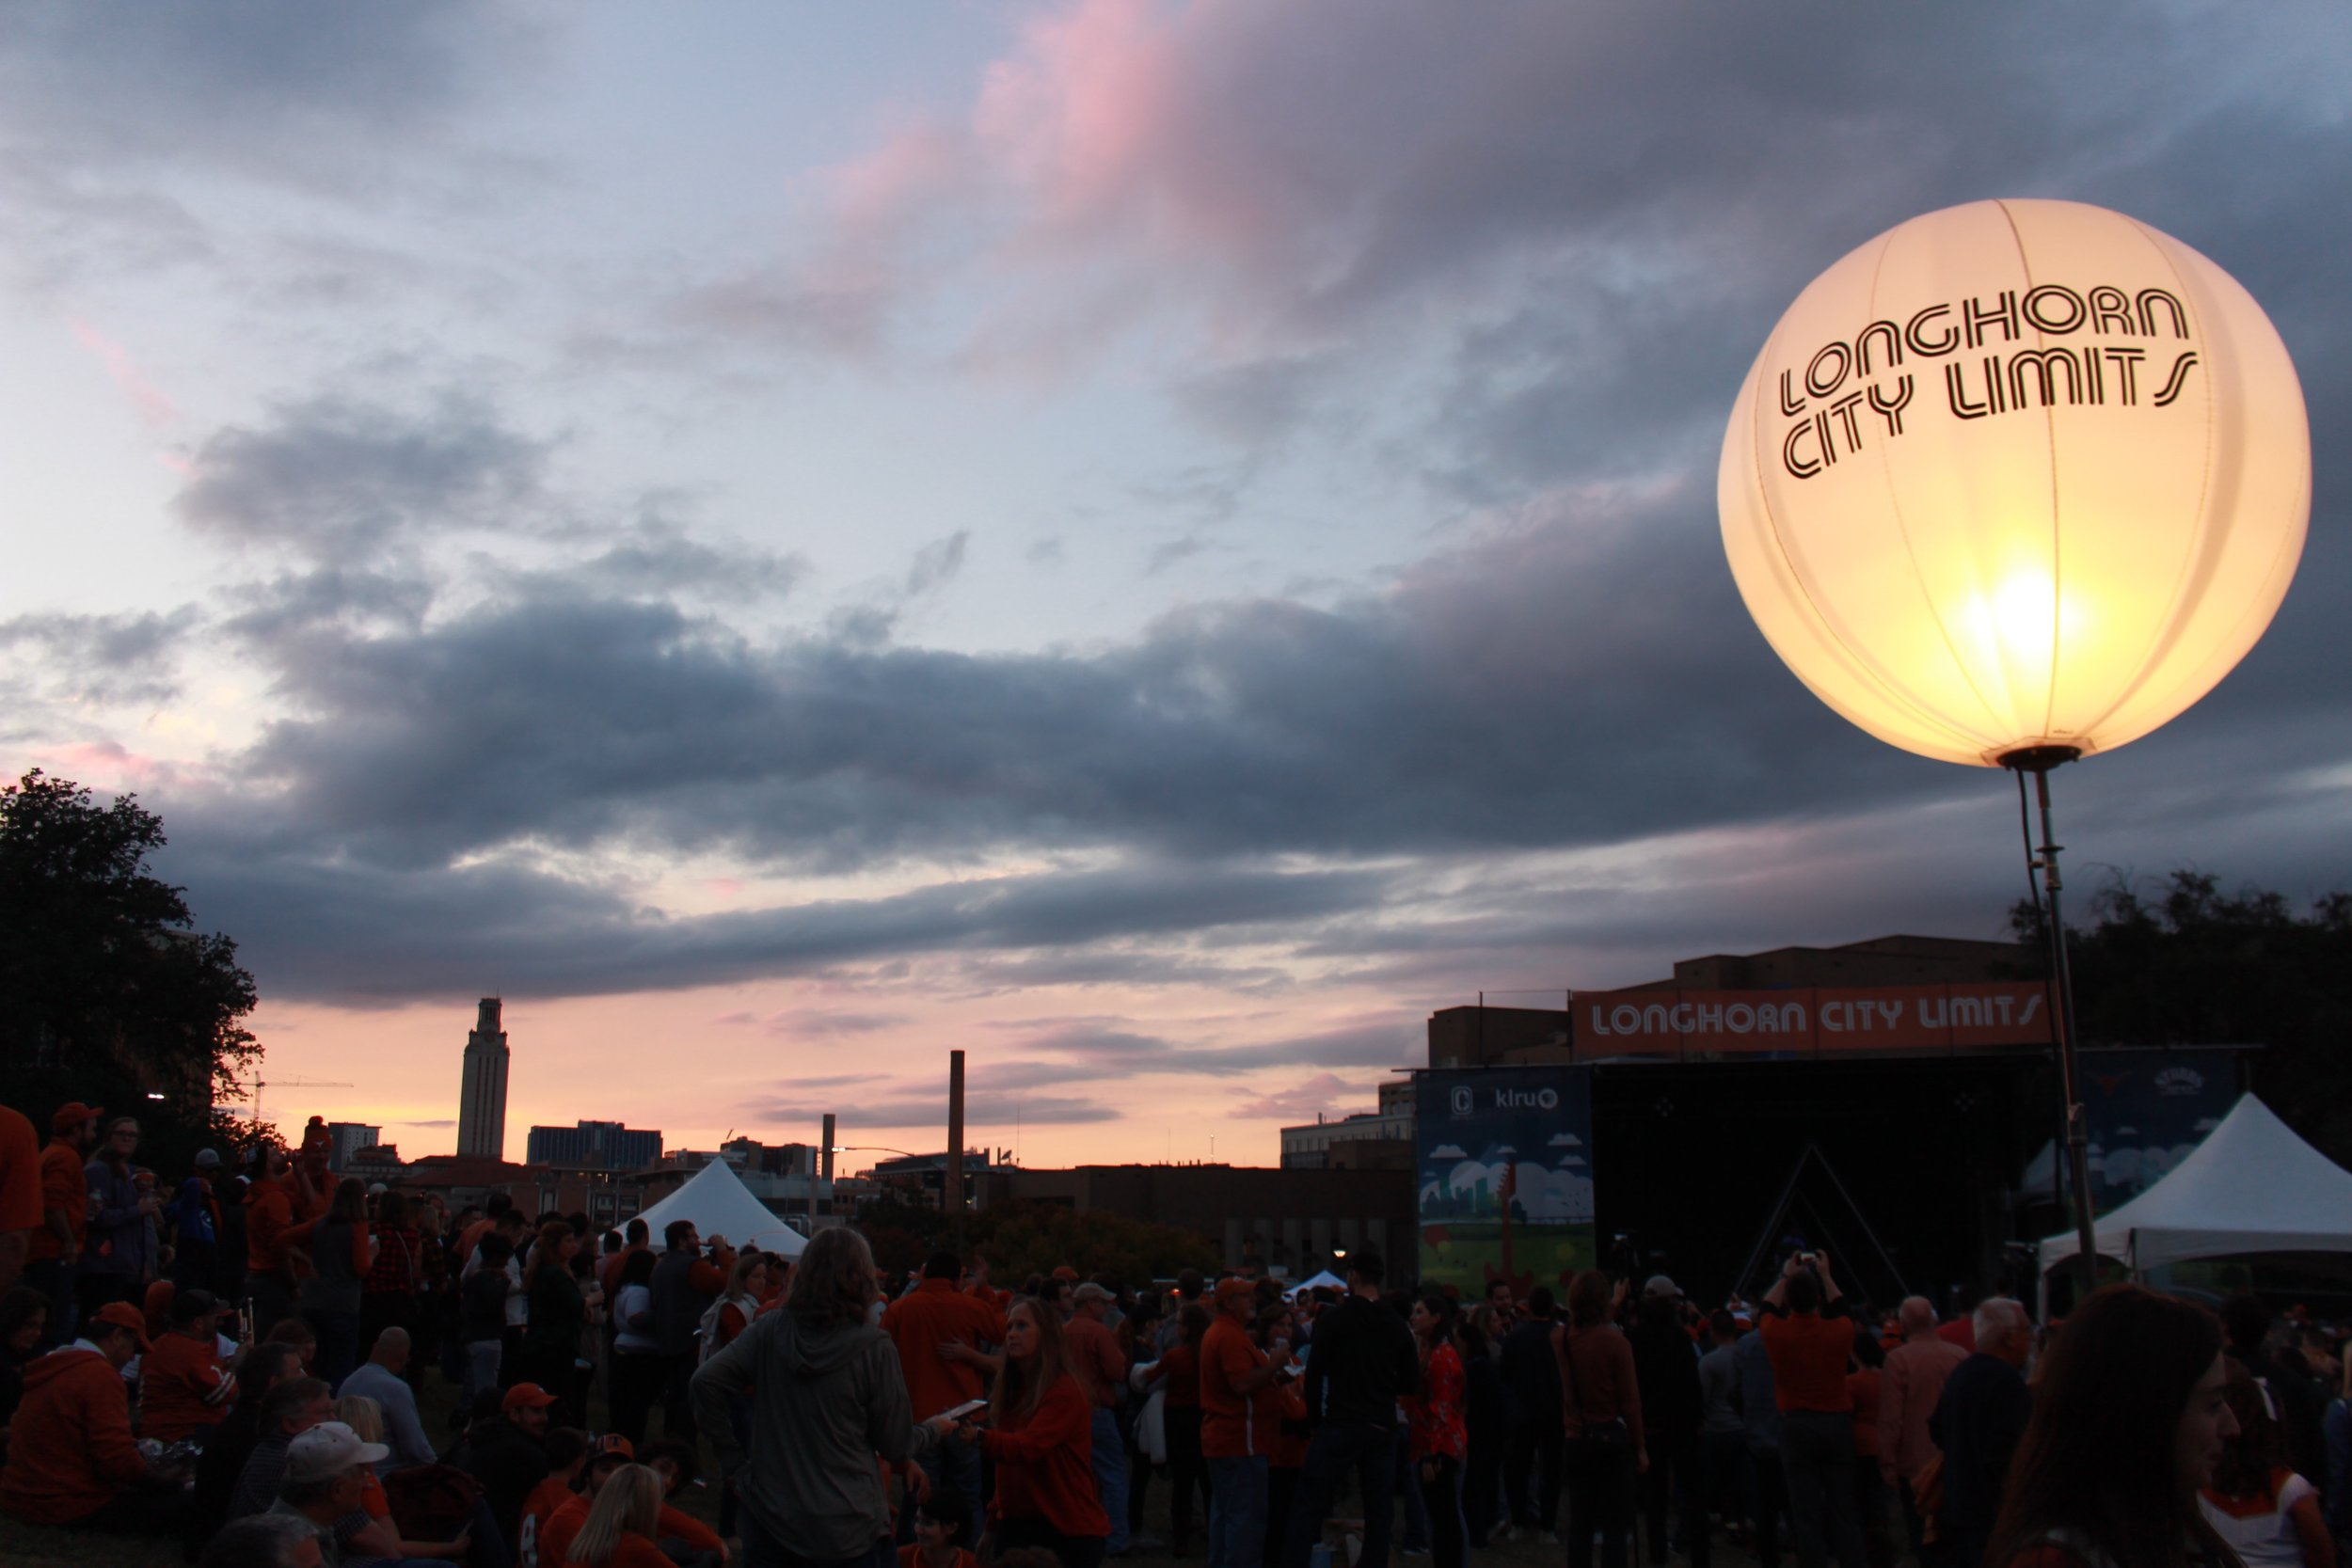 Longhorn City Limits is a play on Austin's biggest music festival, Austin City Limits.